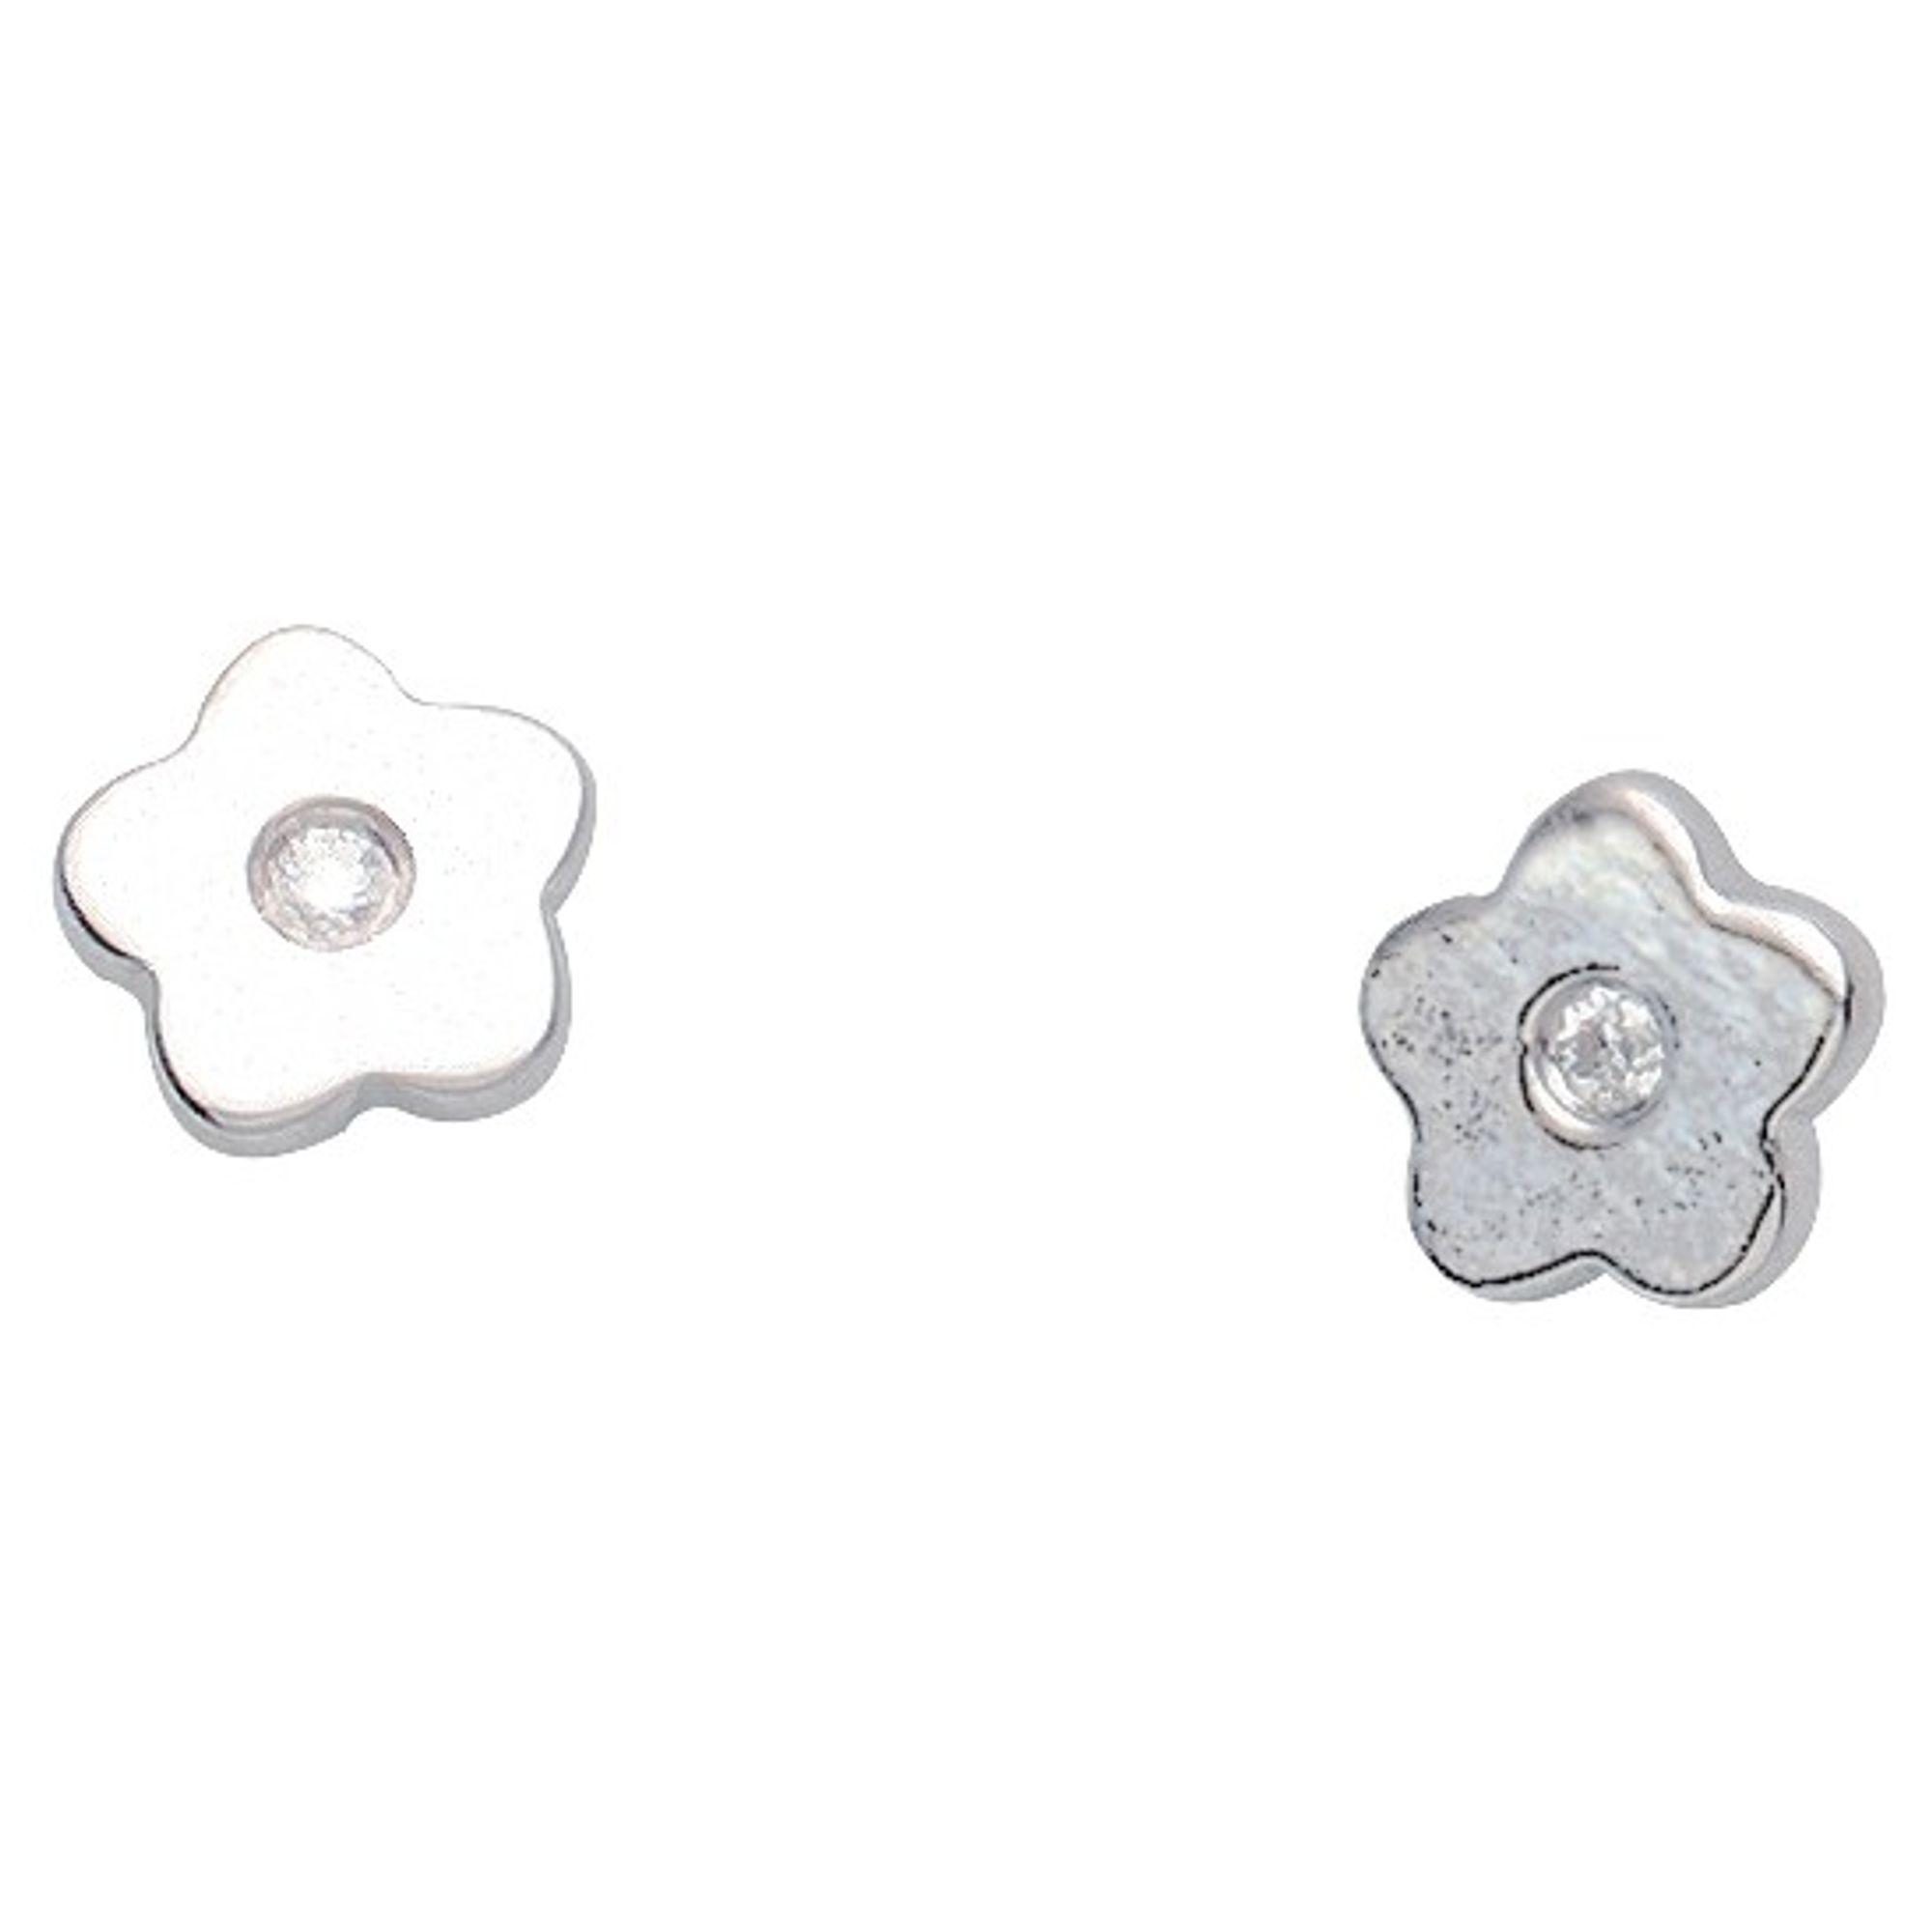 Basic Silber 01.KS131 Mädchen Ohrstecker Blume Silber Zirkonia weiß